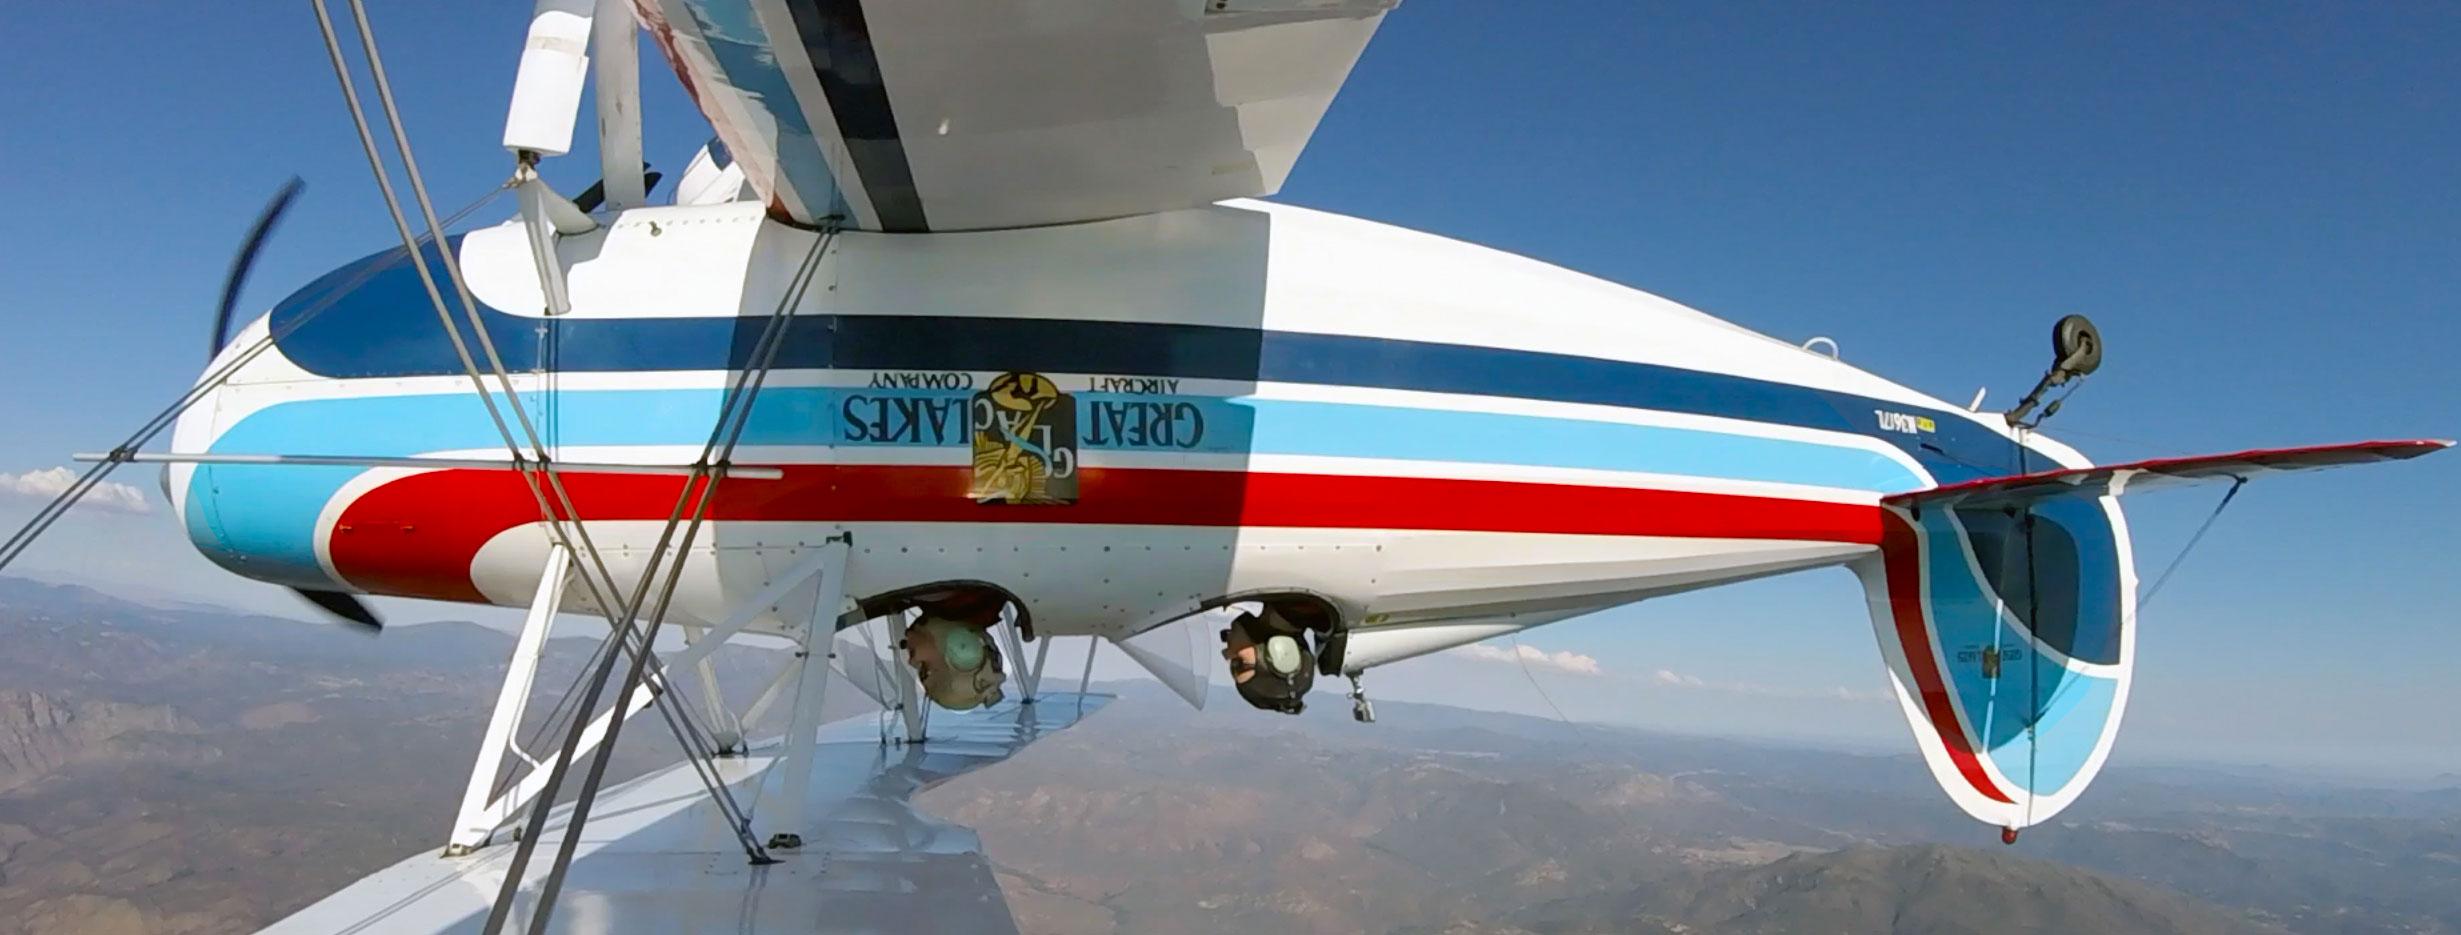 Aerobatics_tour_inverted_Flight_web.jpg